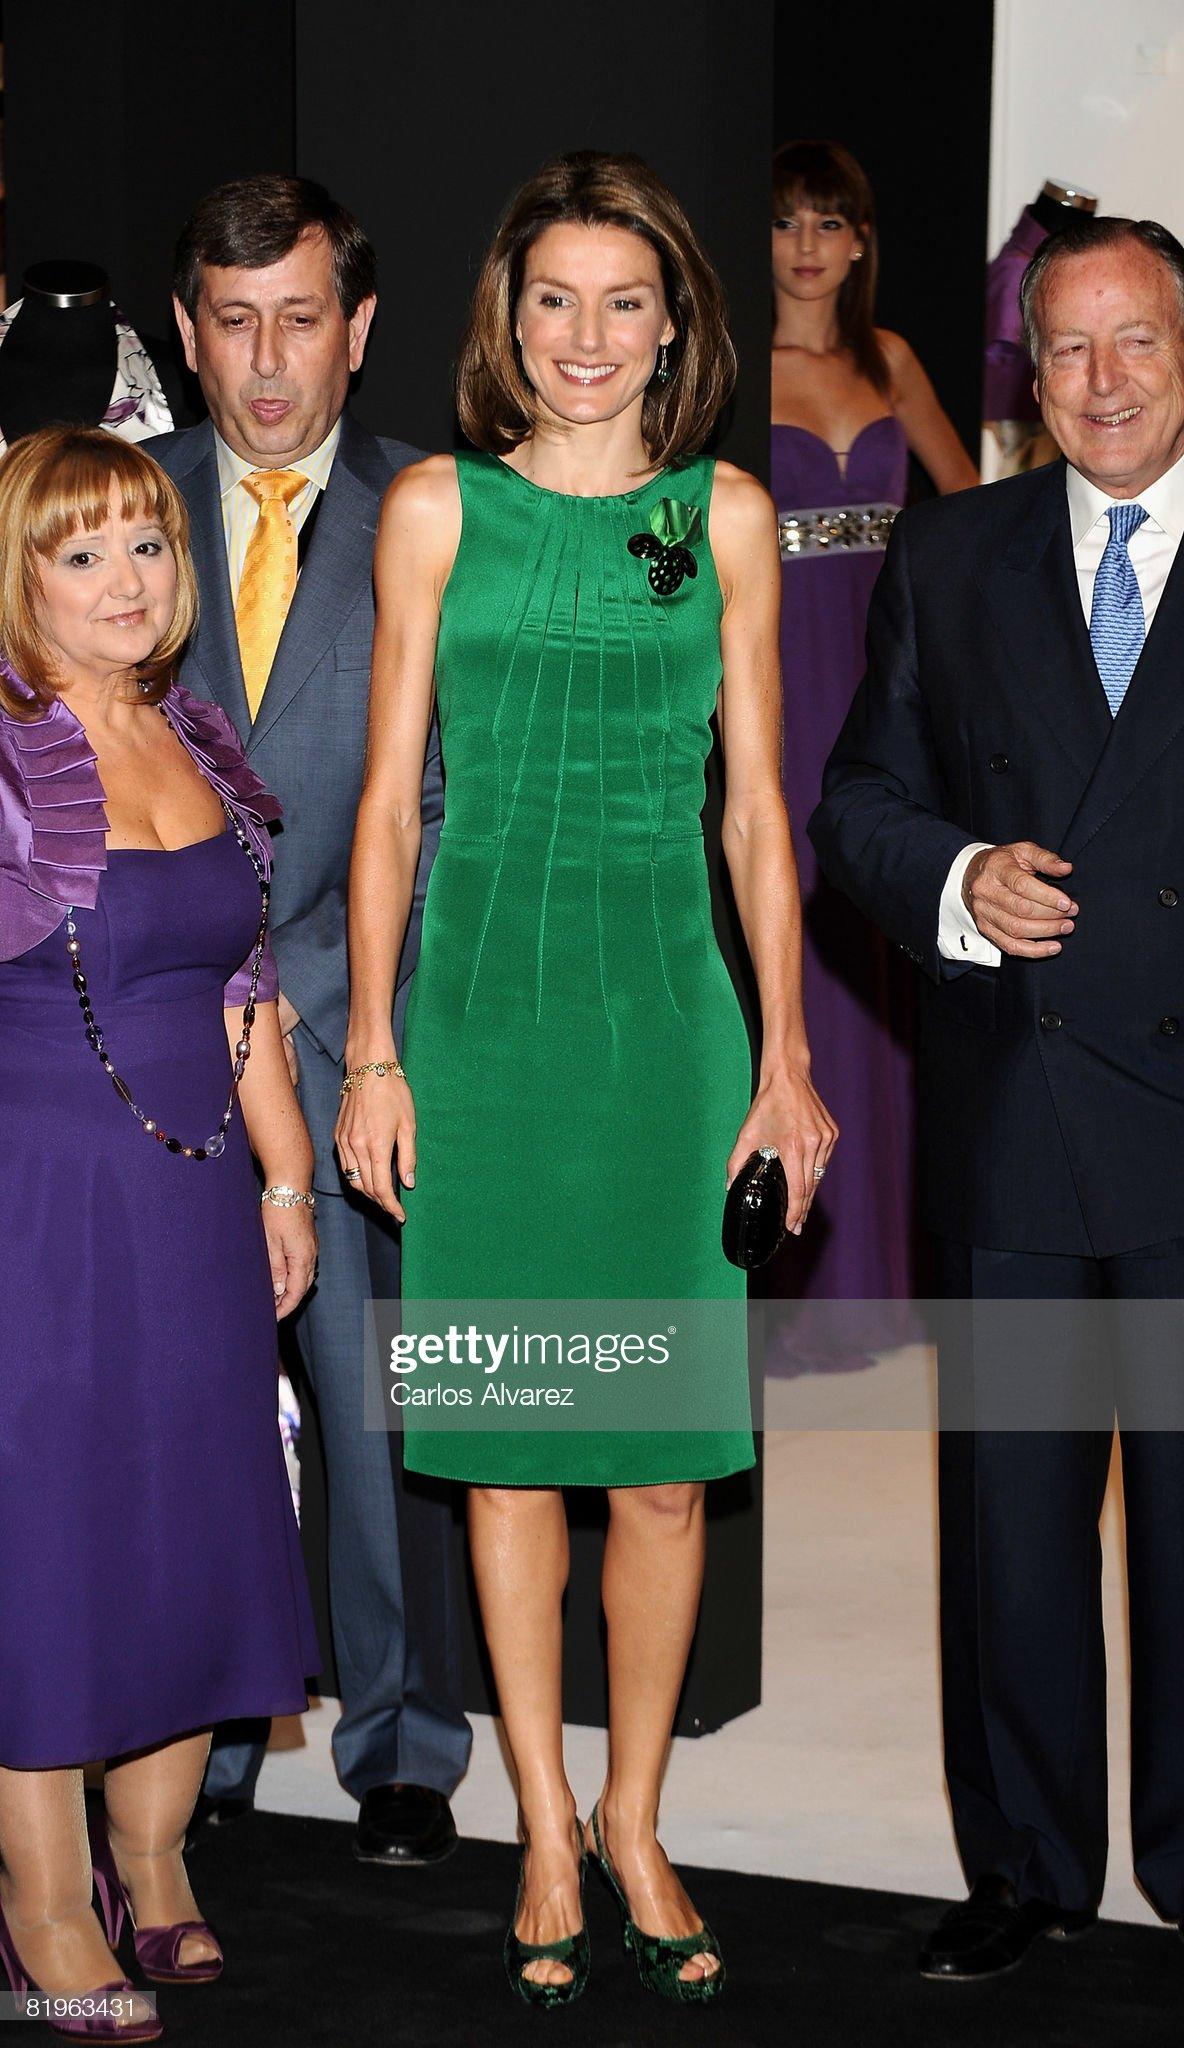 Вечерние наряды Королевы Летиции Princess Letizia Attends 60th SIMM Opening : News Photo